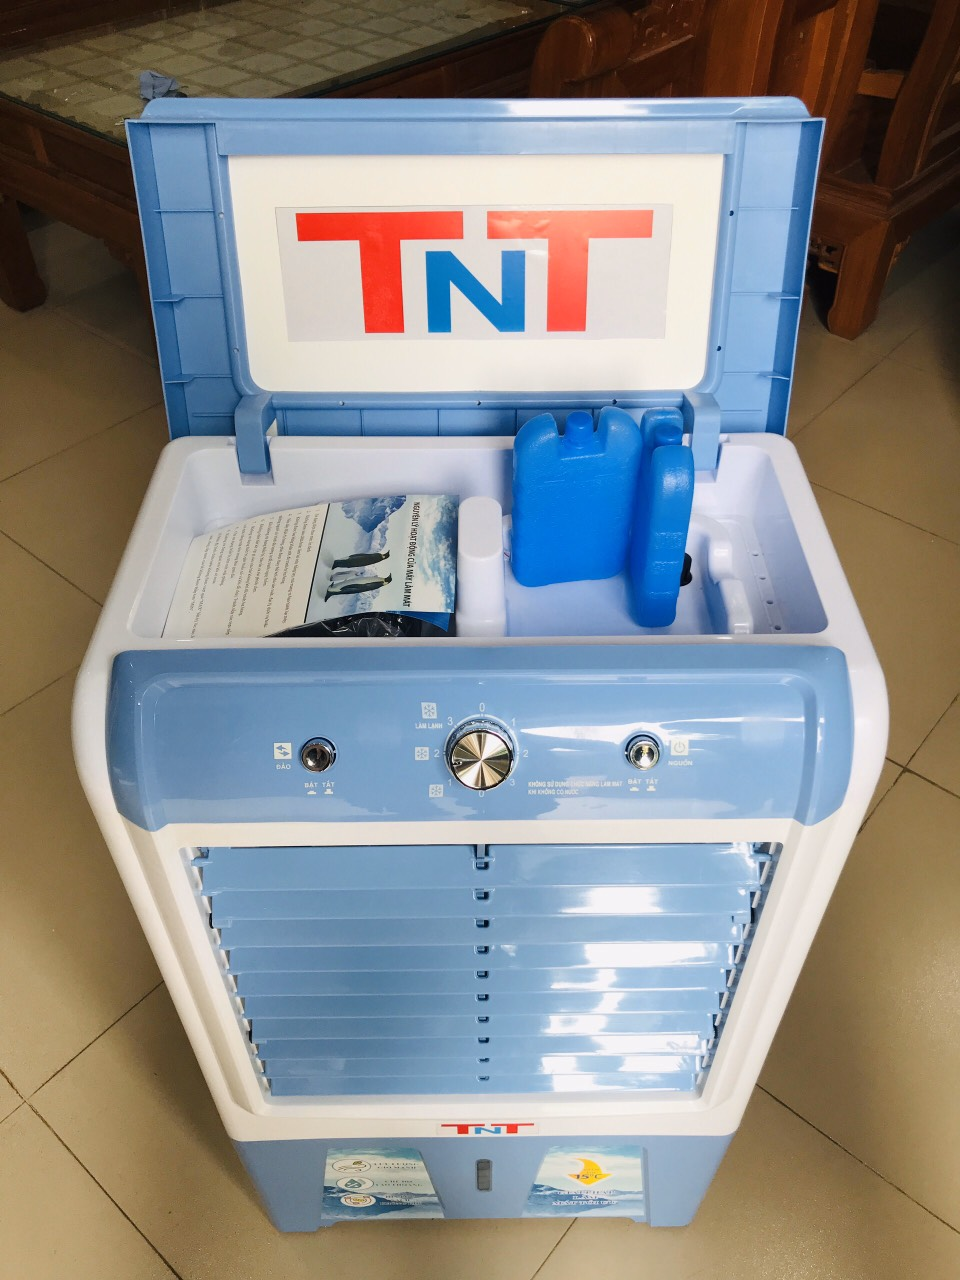 Máy Làm Mát TNT HS-35 ( 35 Lít )